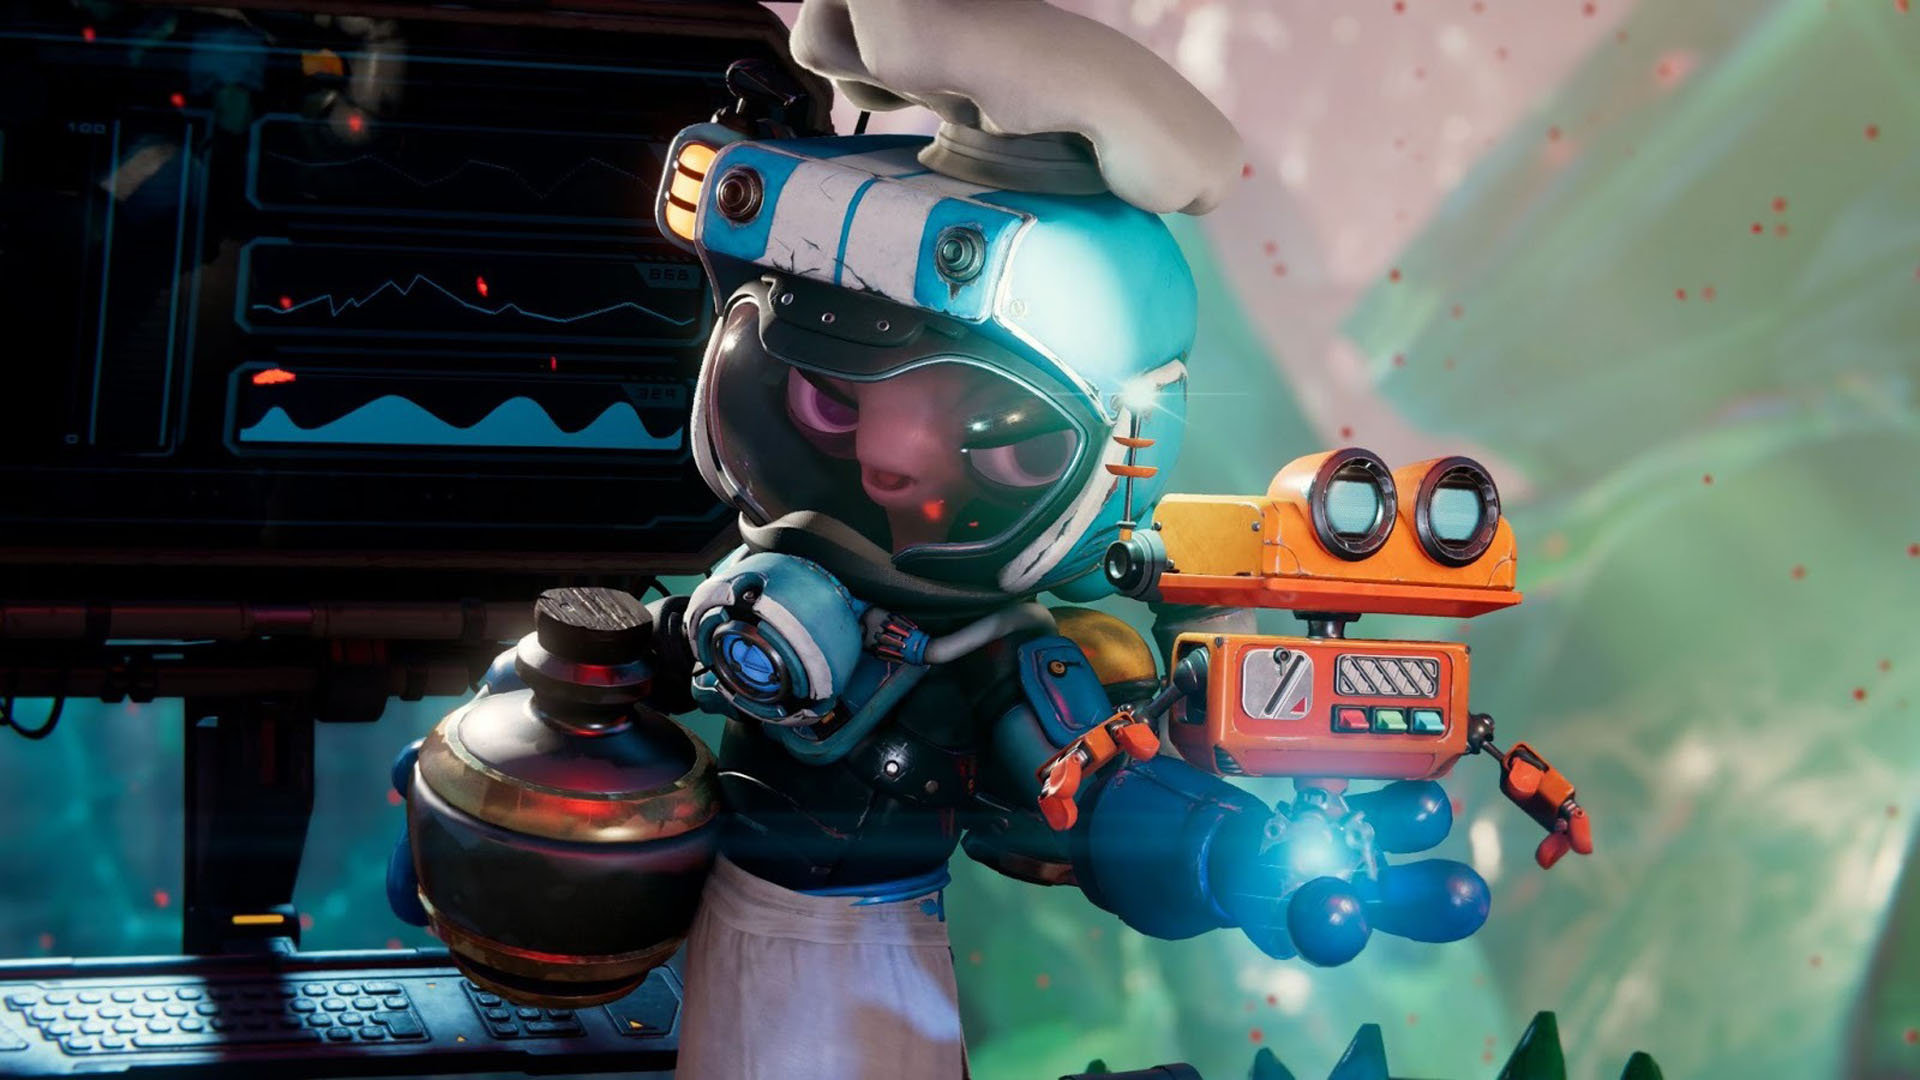 Ratchet & Clank: Spiabot Guida